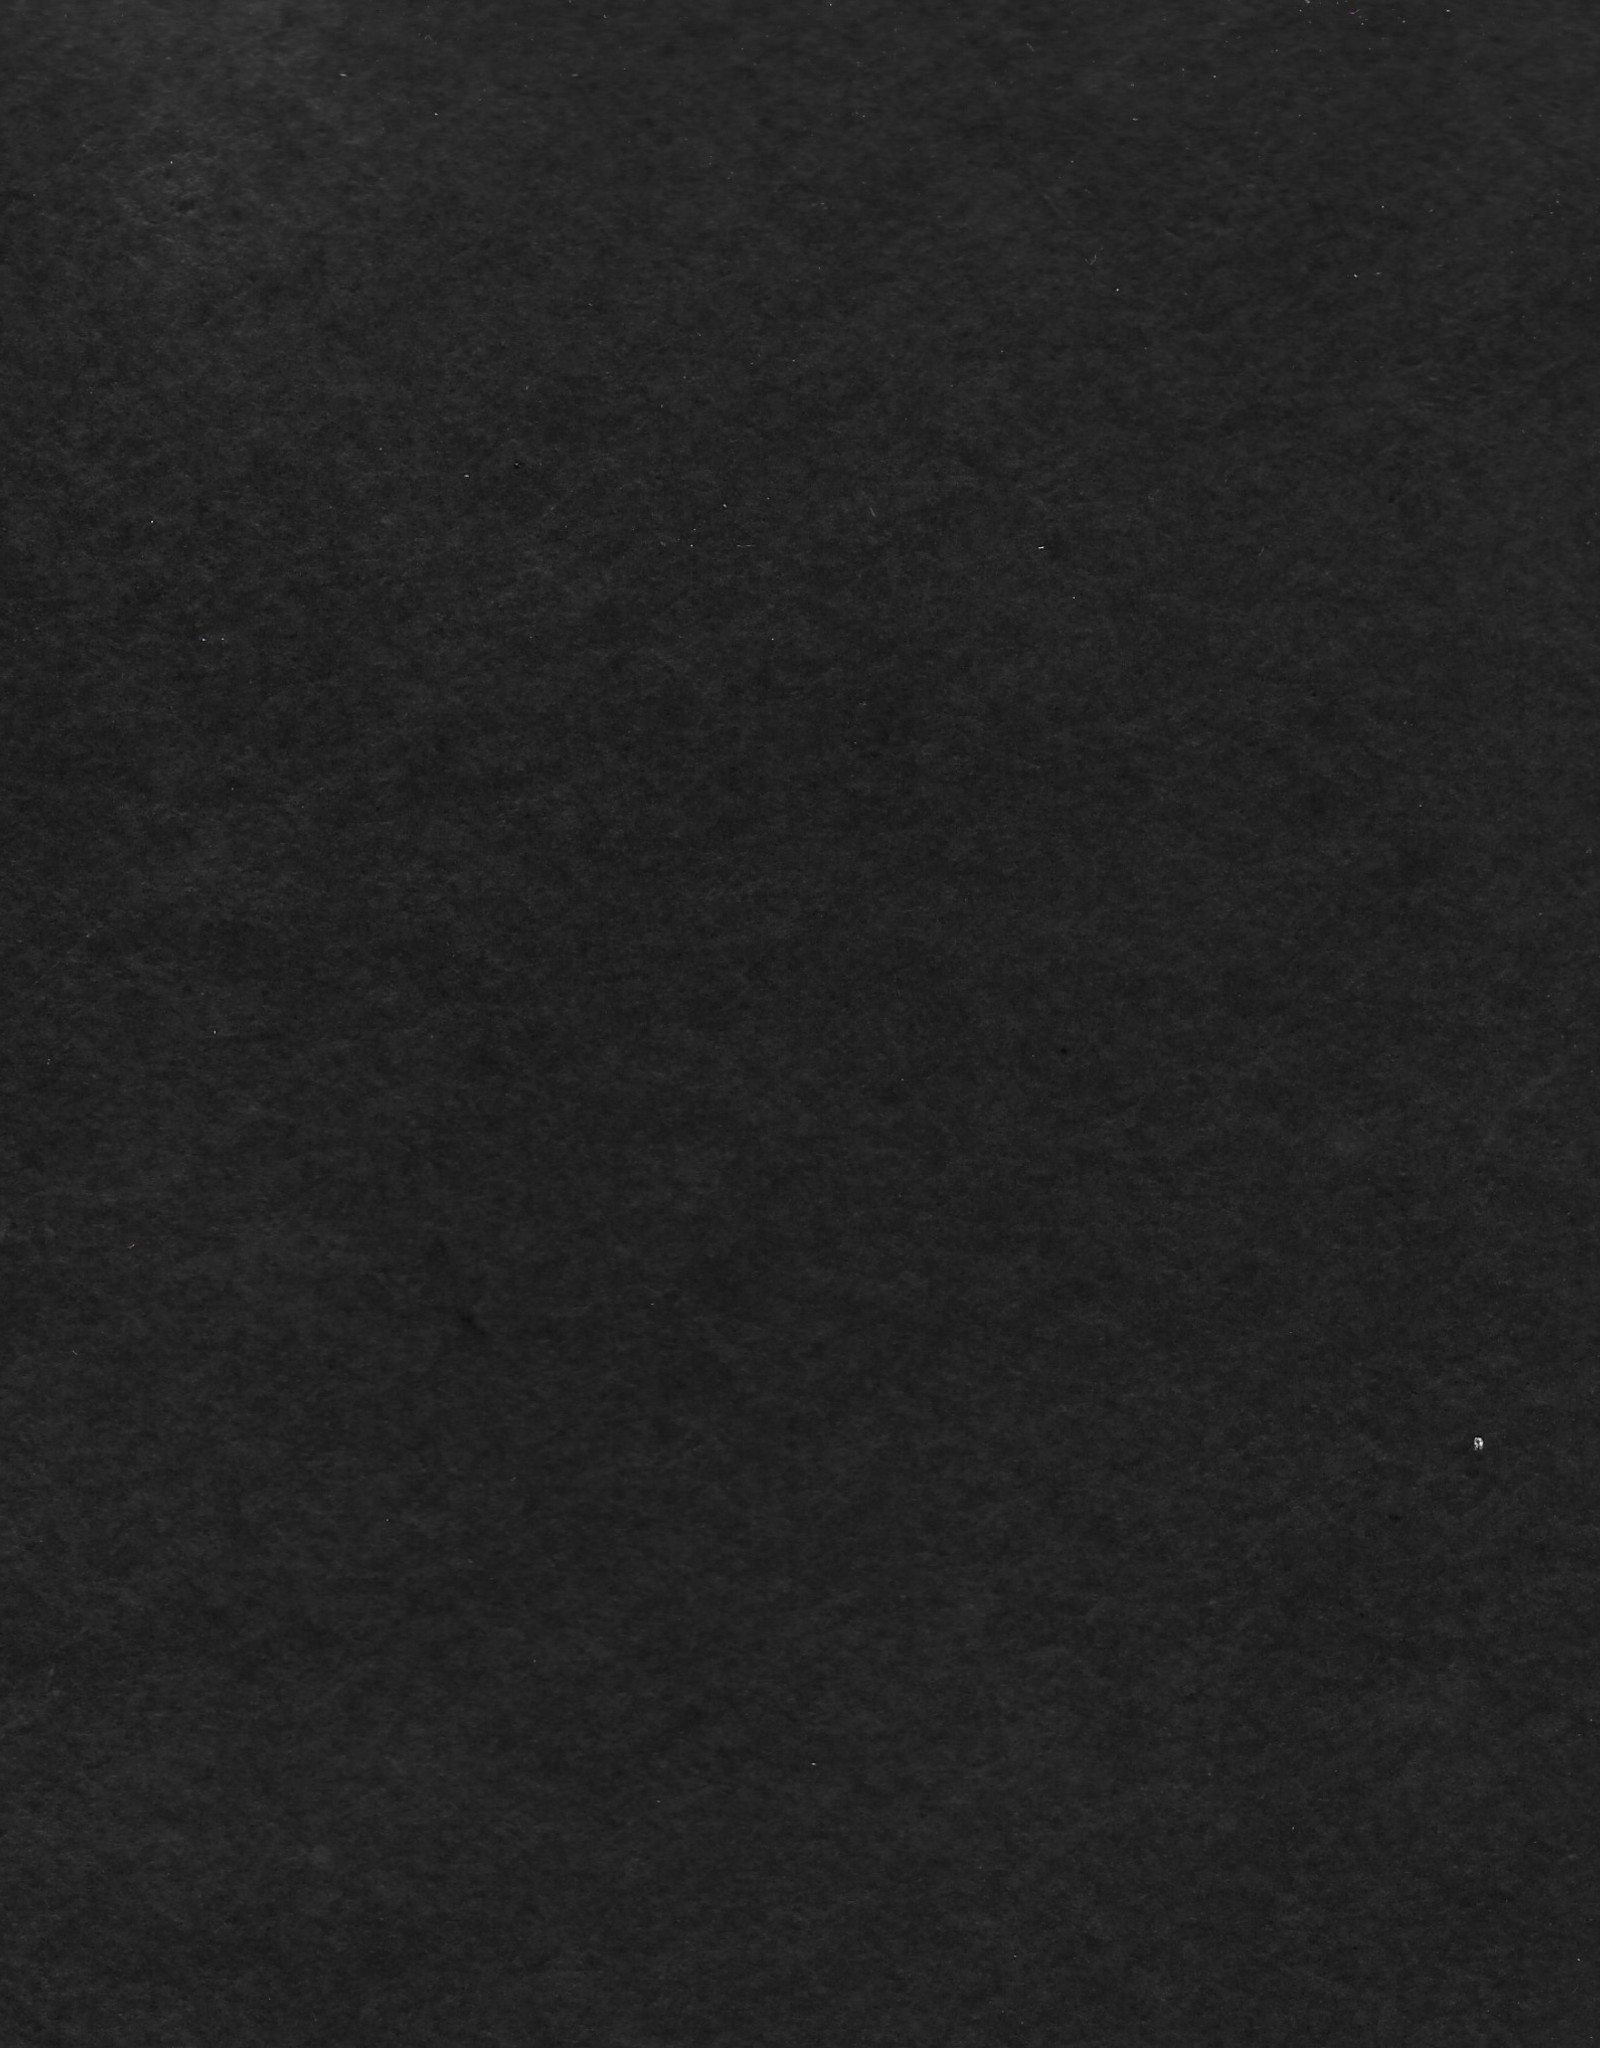 "Indian Watercolor Black, 140# Hot Press, 12"" x 18"", 5 Sheets"